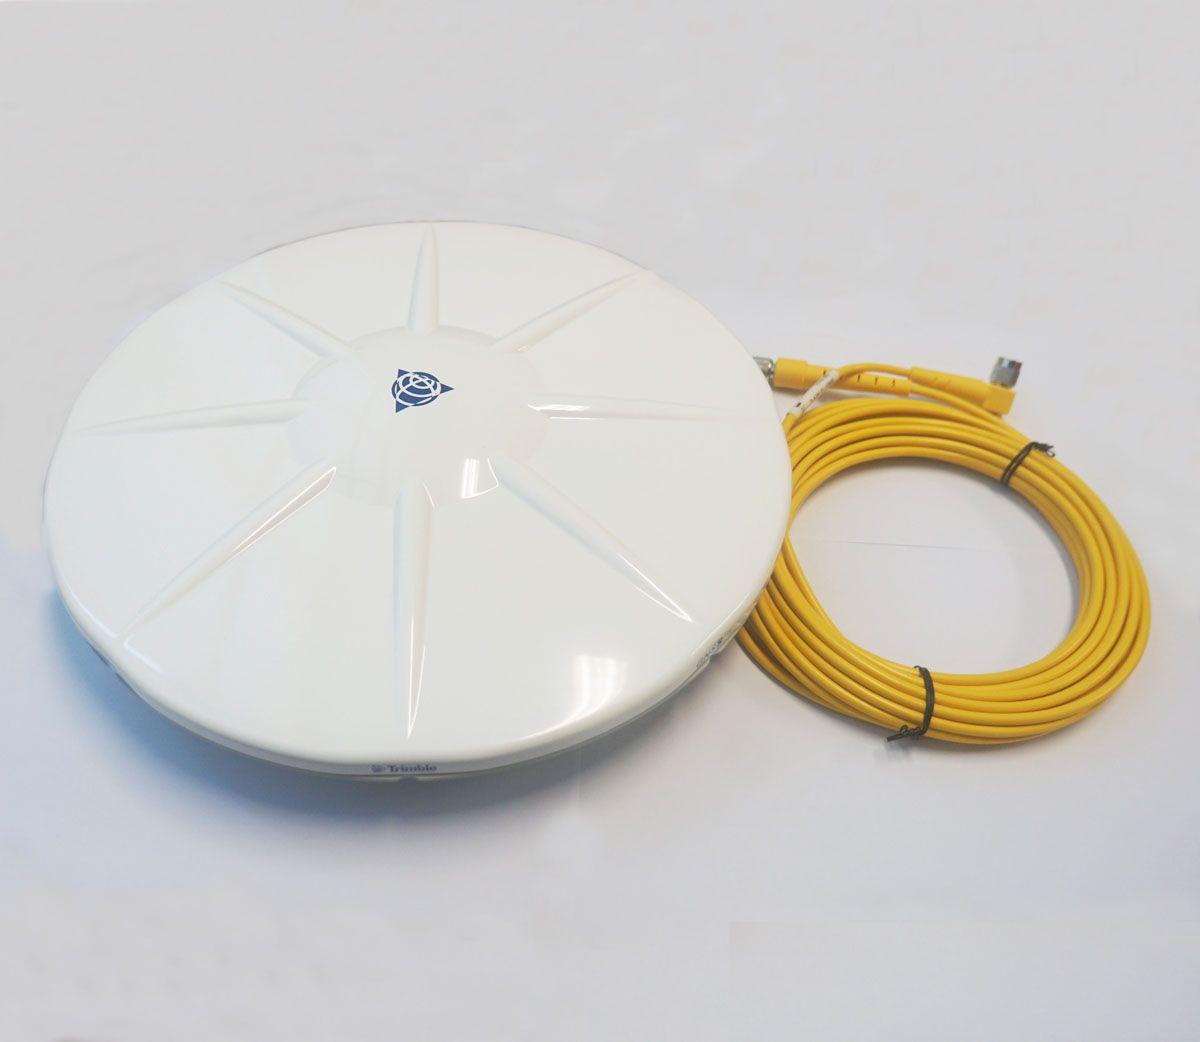 Antena Zephyr Geodetic - Base RTK